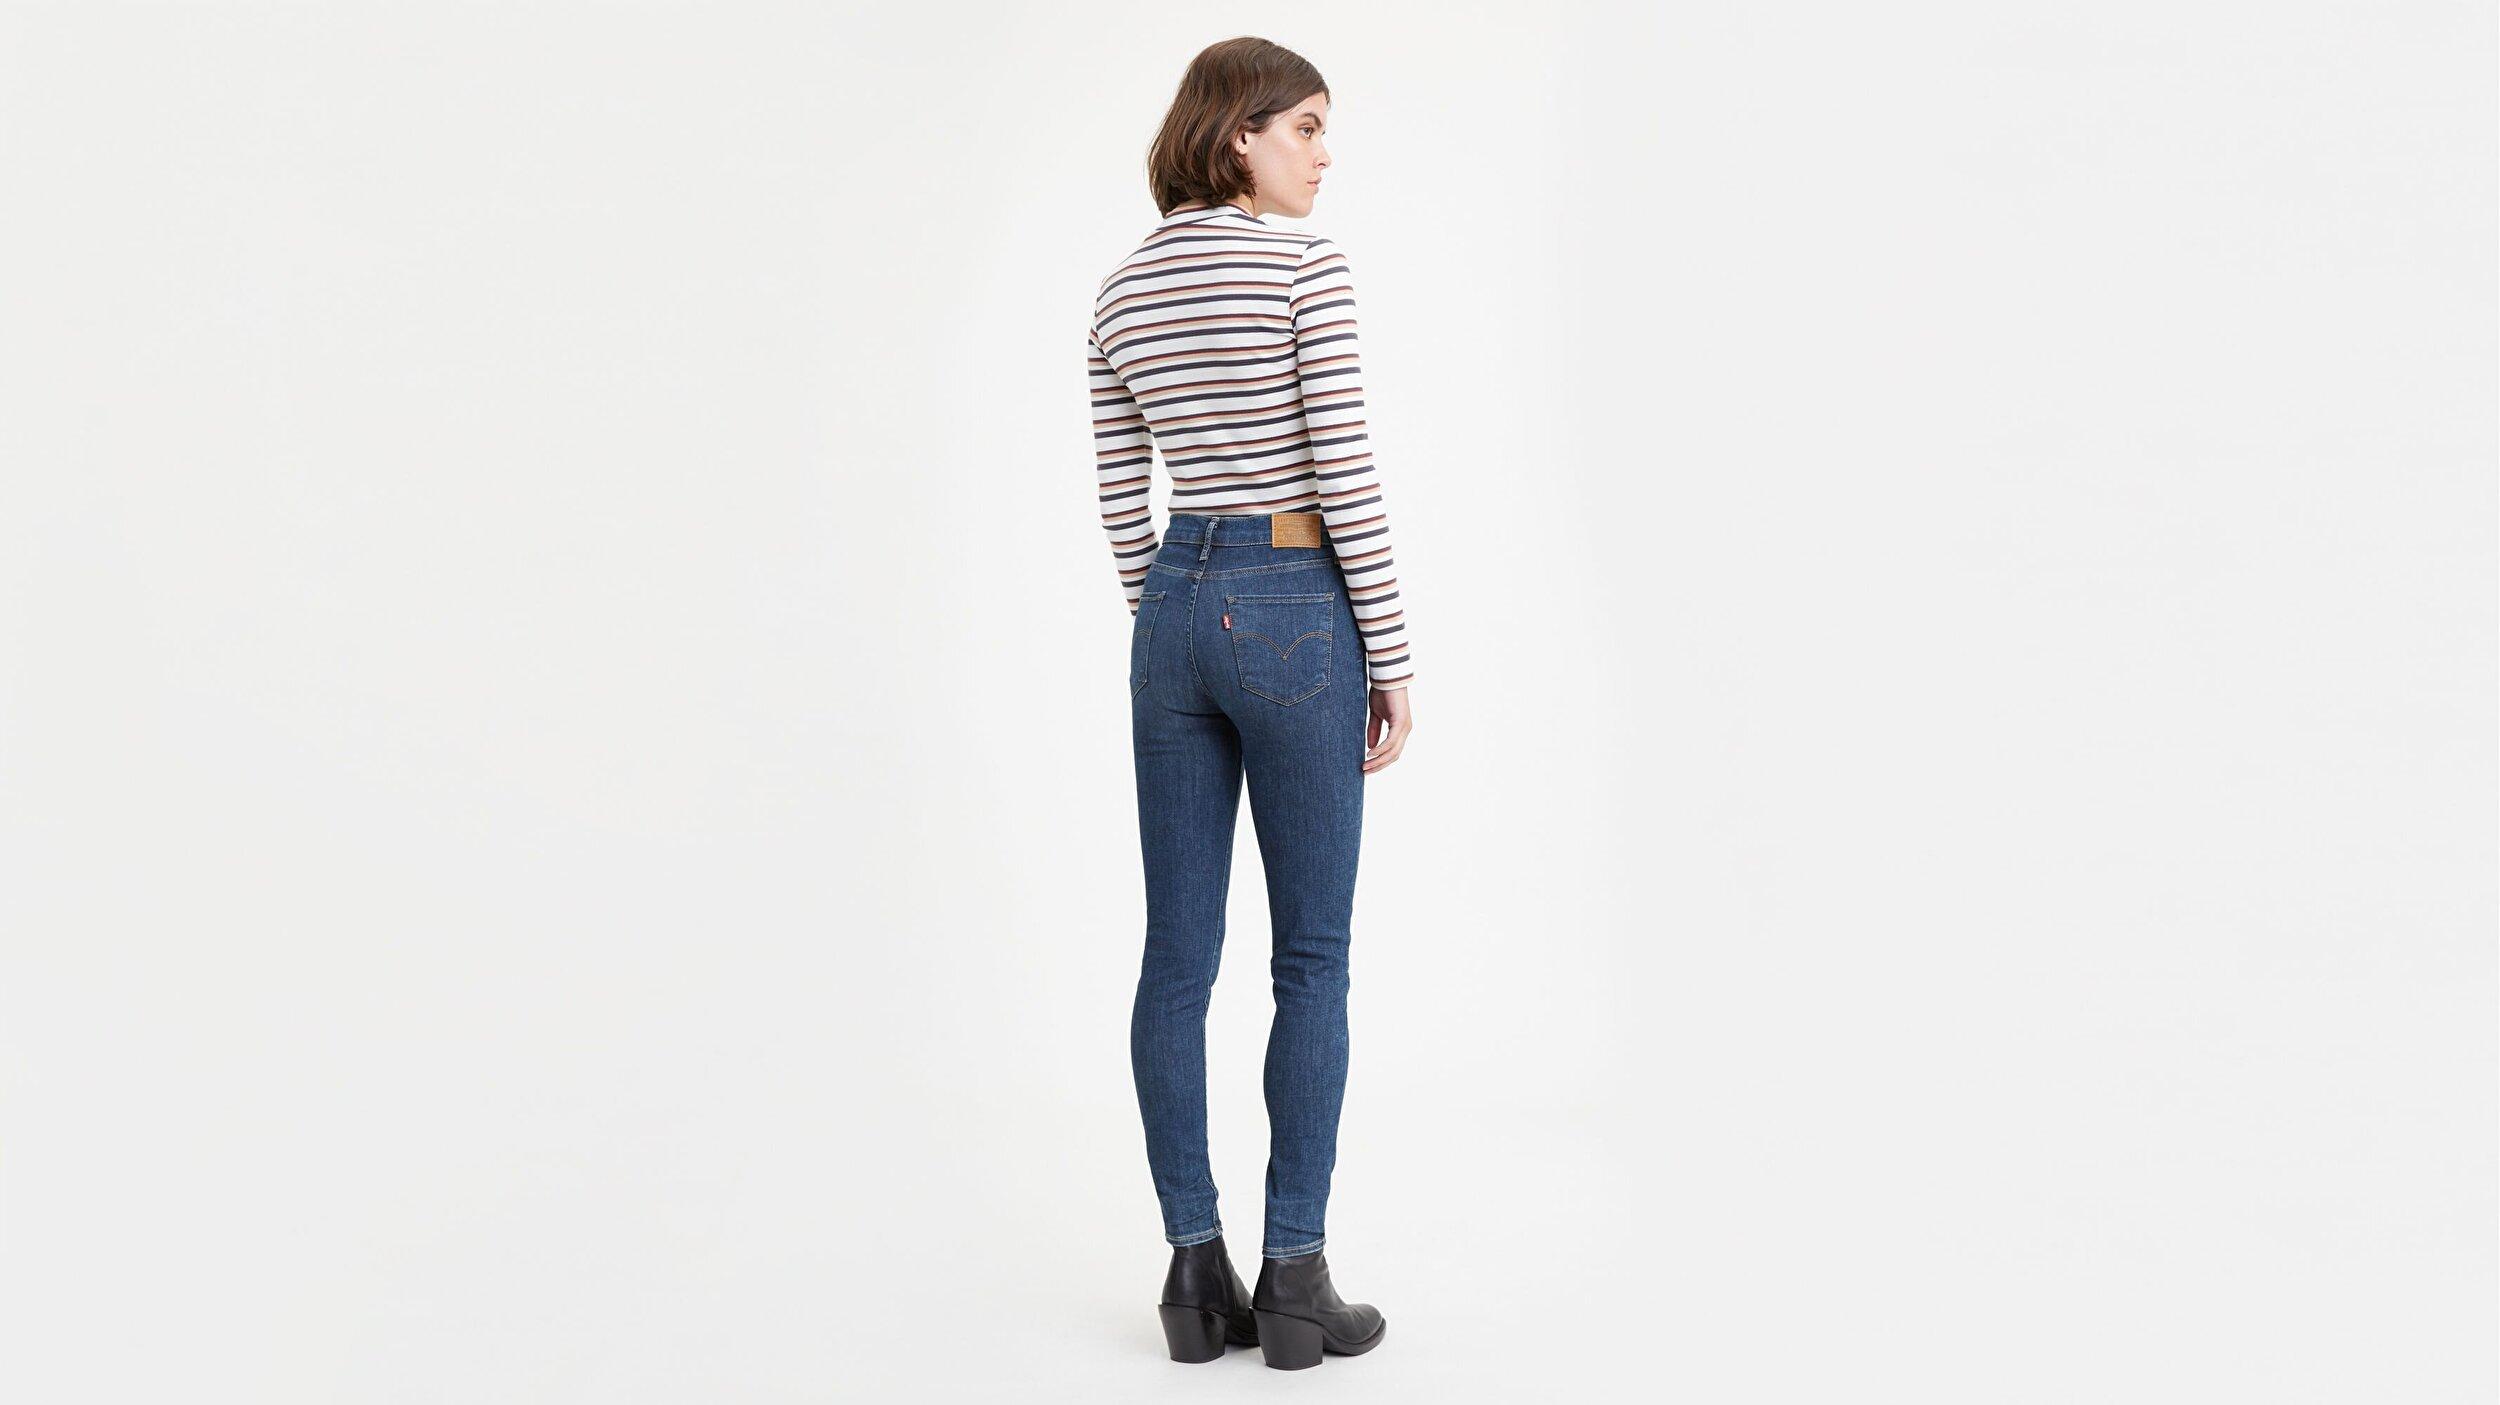 720 Yüksek Bel Süper Skinny Kadın Jean Pantolon-Echo Storm